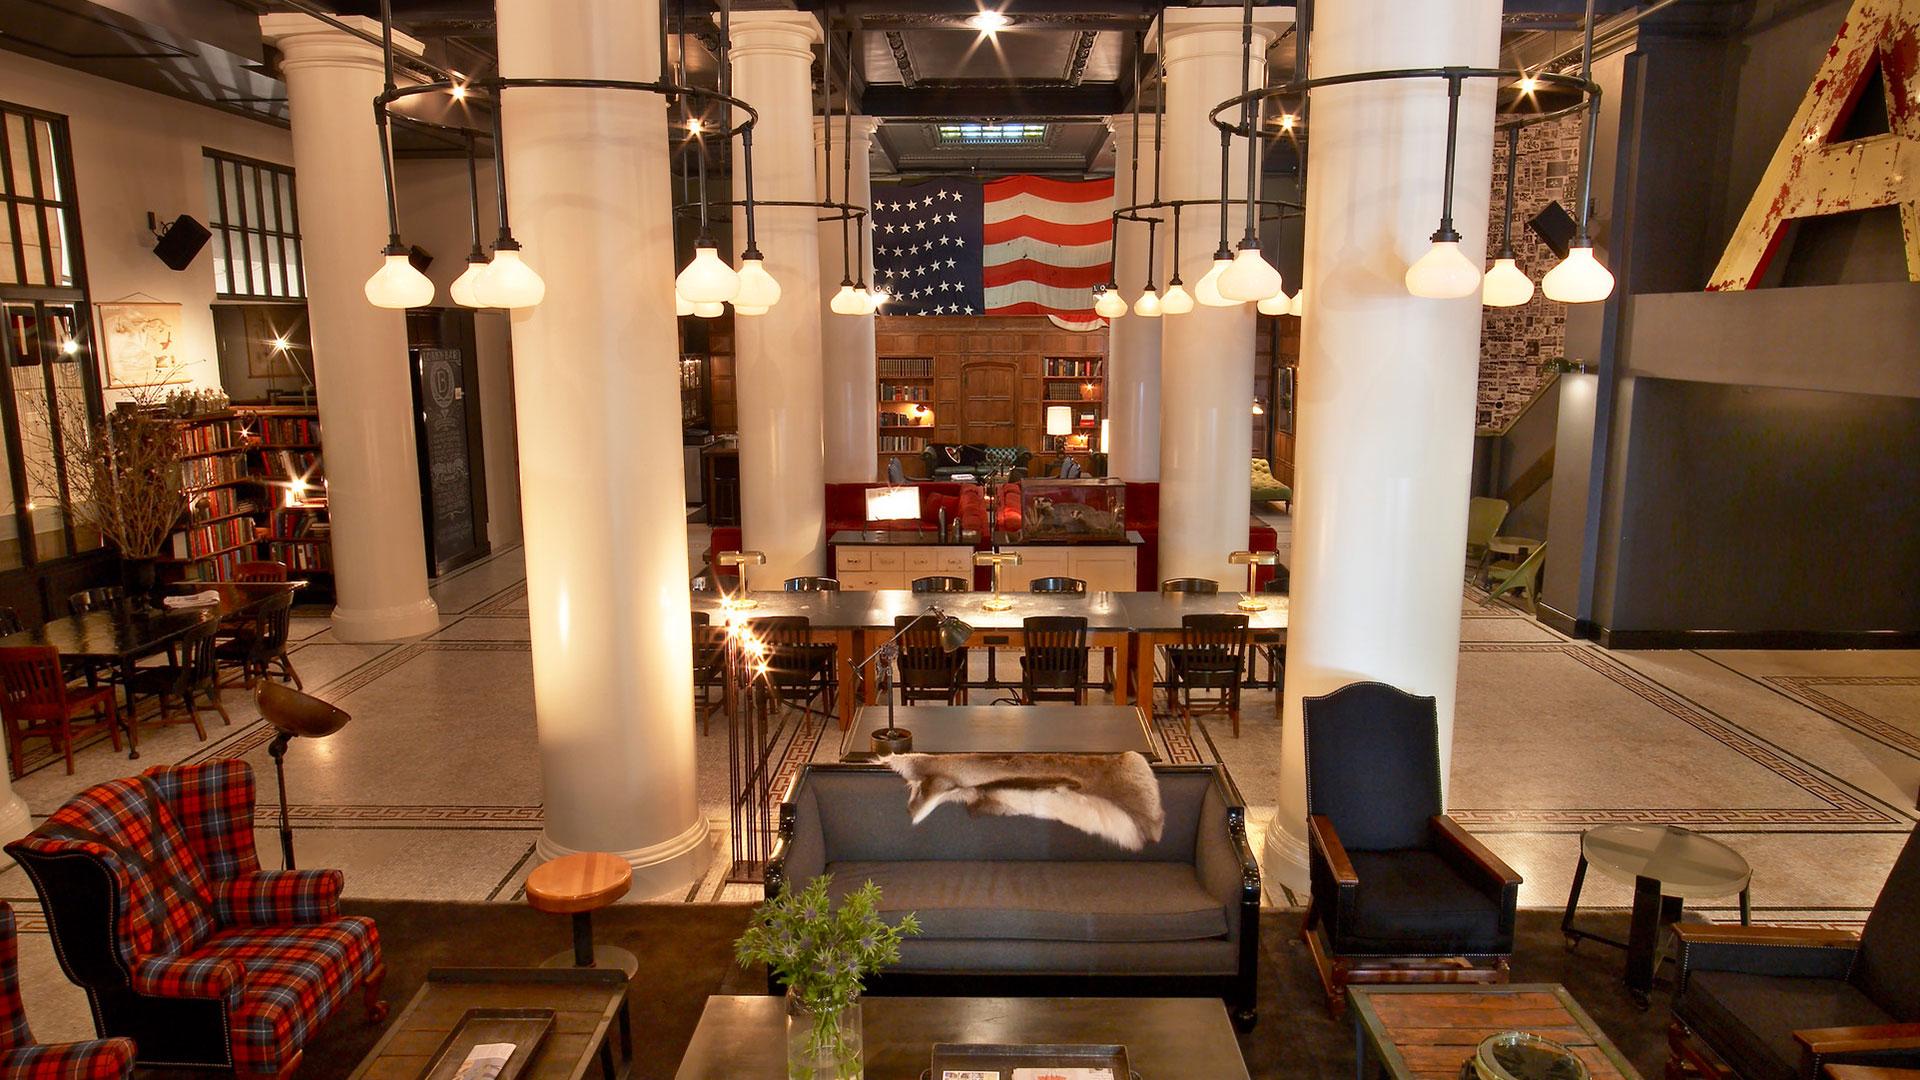 Hotel ACE de Nueva York hero asset